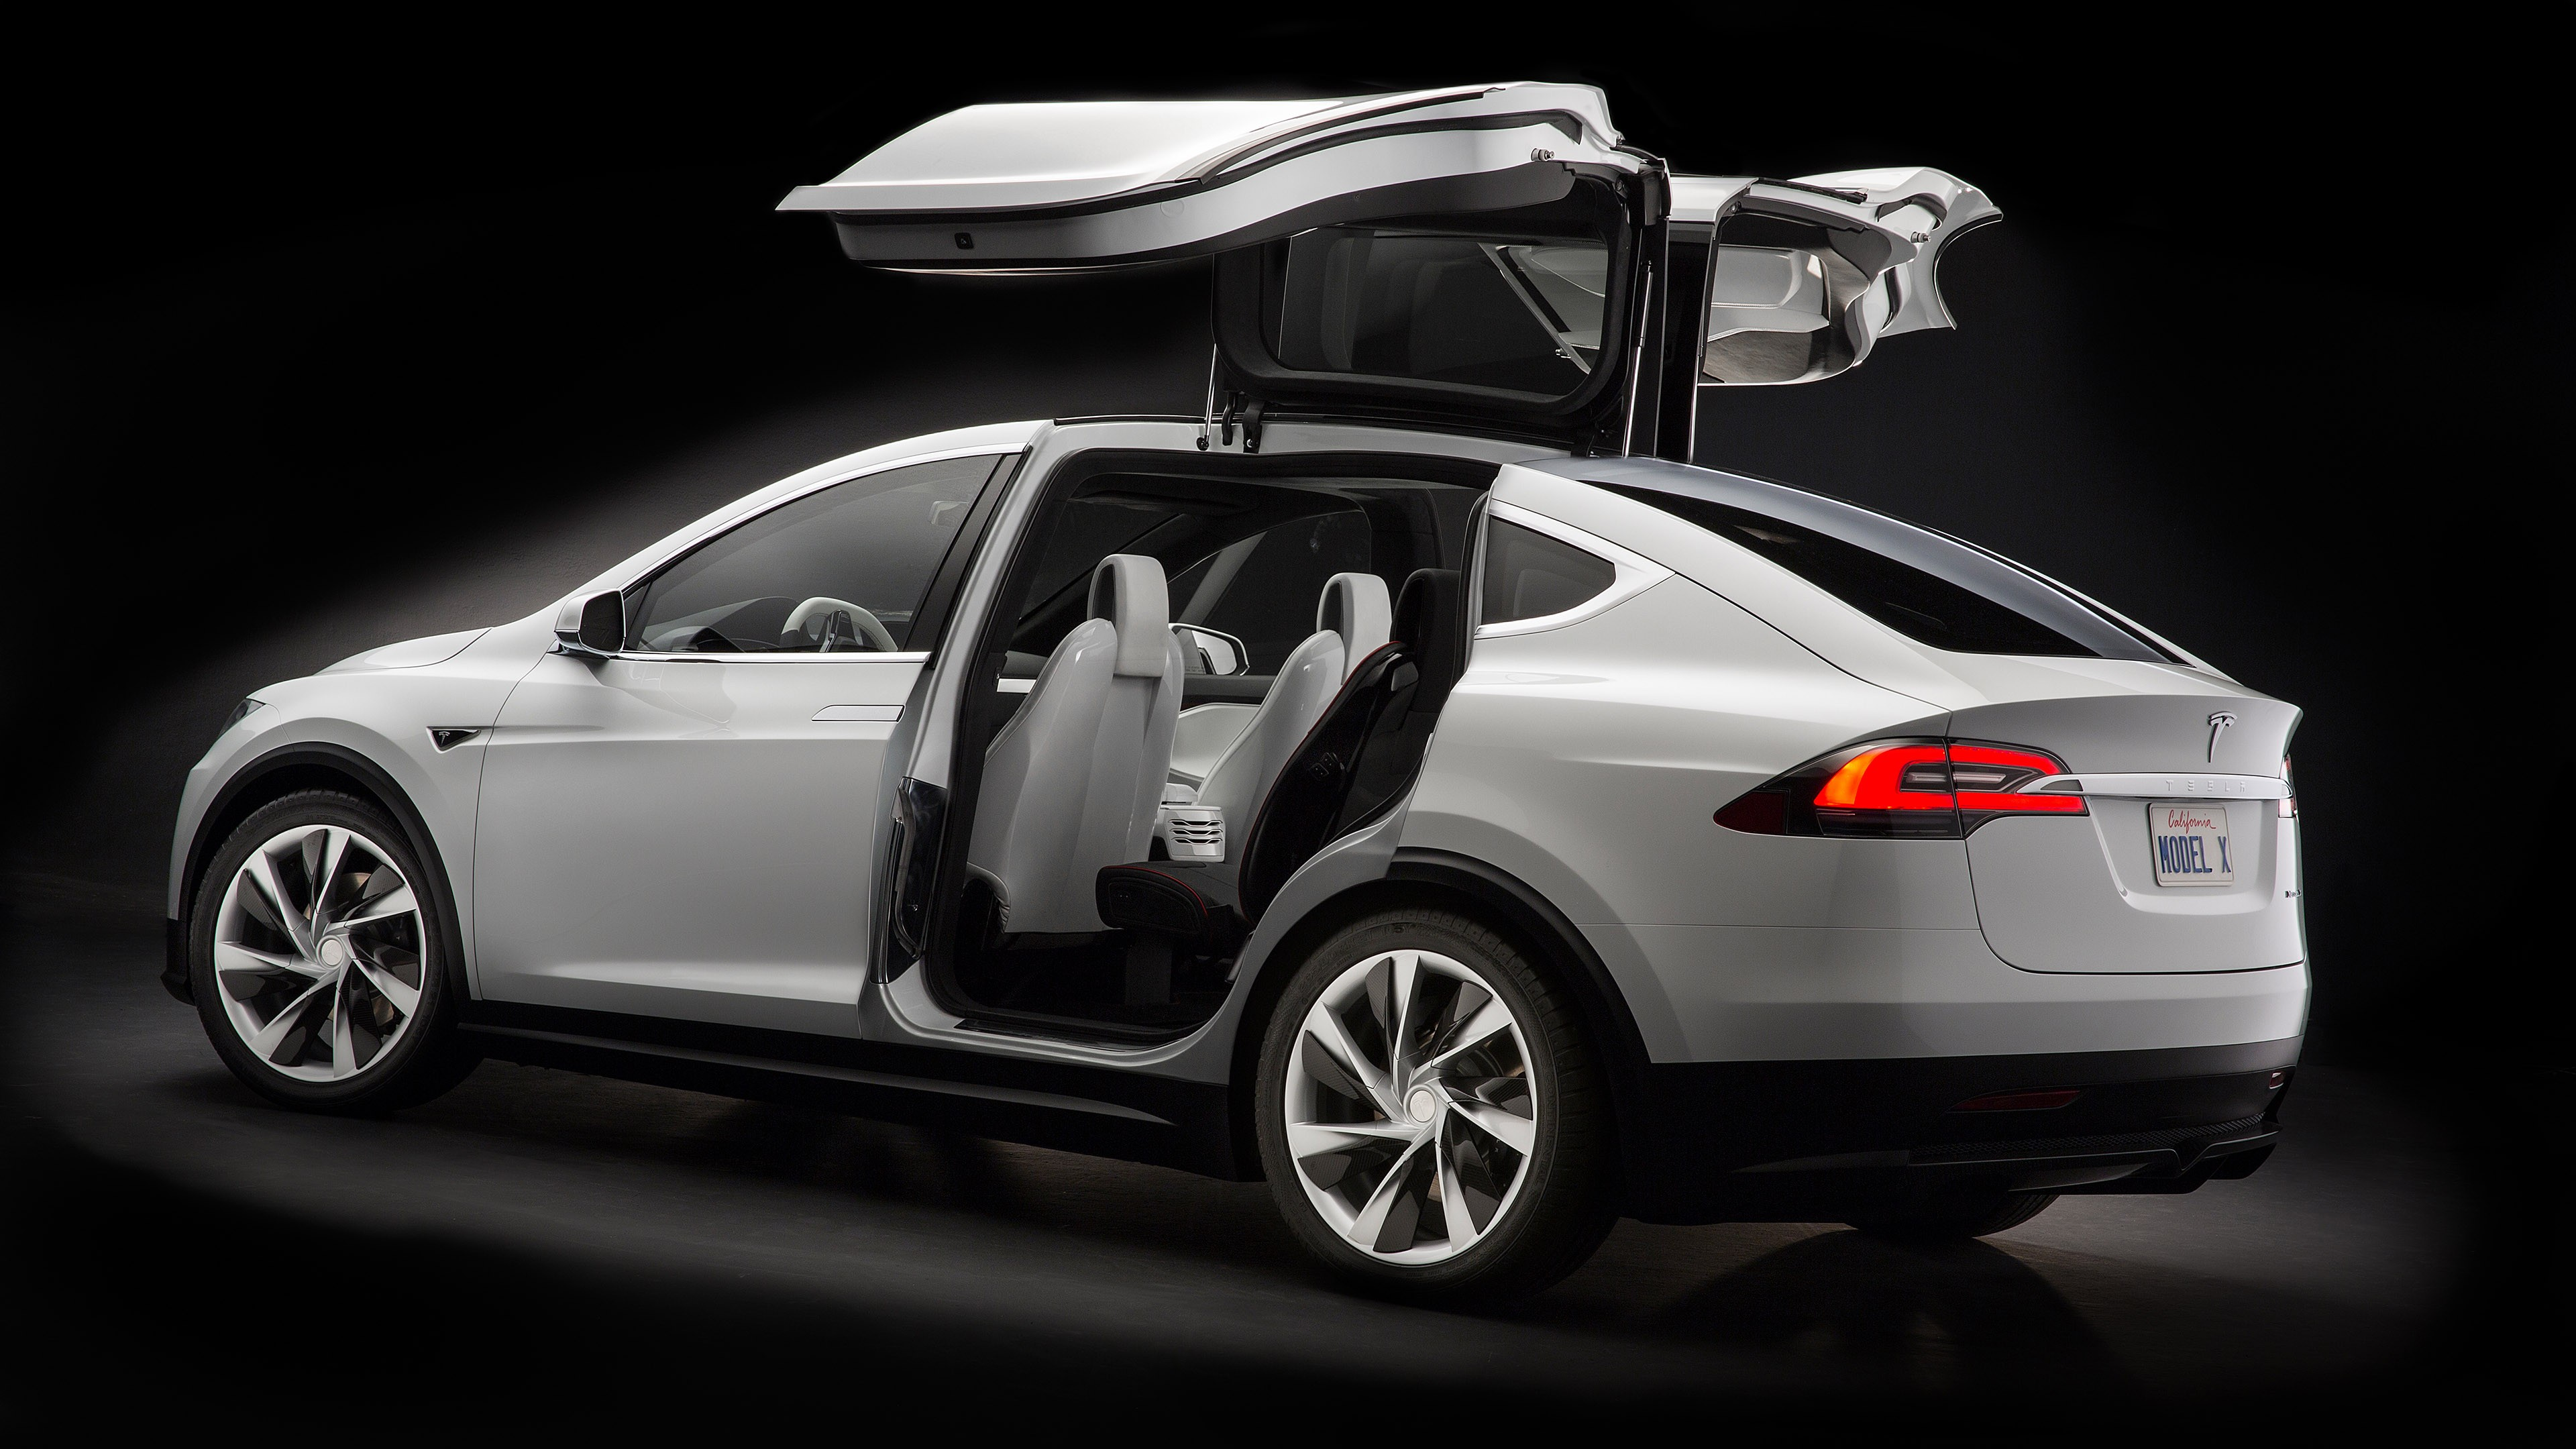 wallpaper tesla model x white electric cars suv 2016 cars bikes 7308. Black Bedroom Furniture Sets. Home Design Ideas